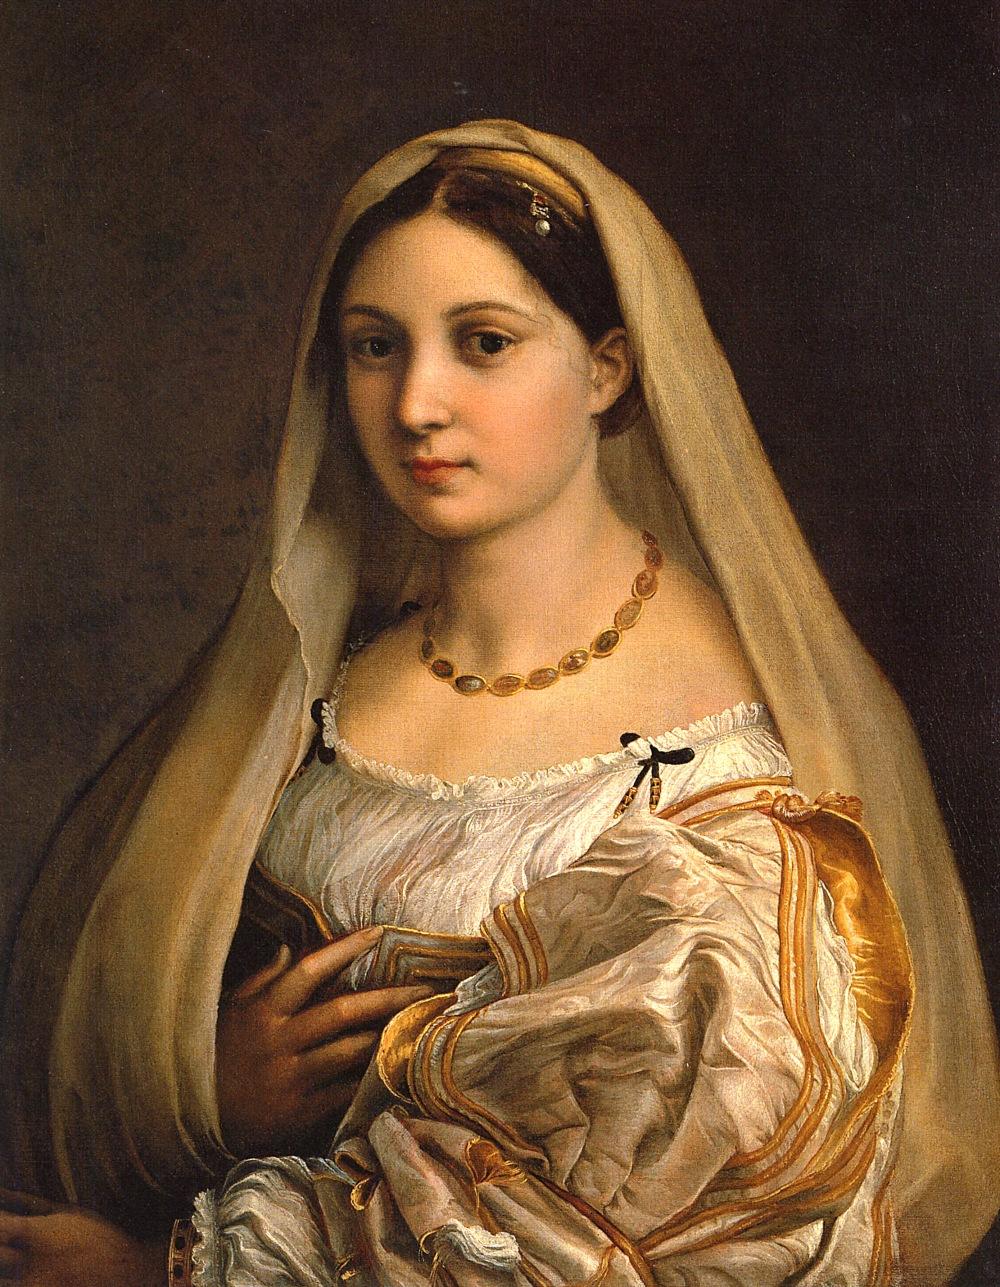 Rafael Sanzio. Dama velada. Oleo sobre lienzo. 1515. Palacio Pitti. Florencia.